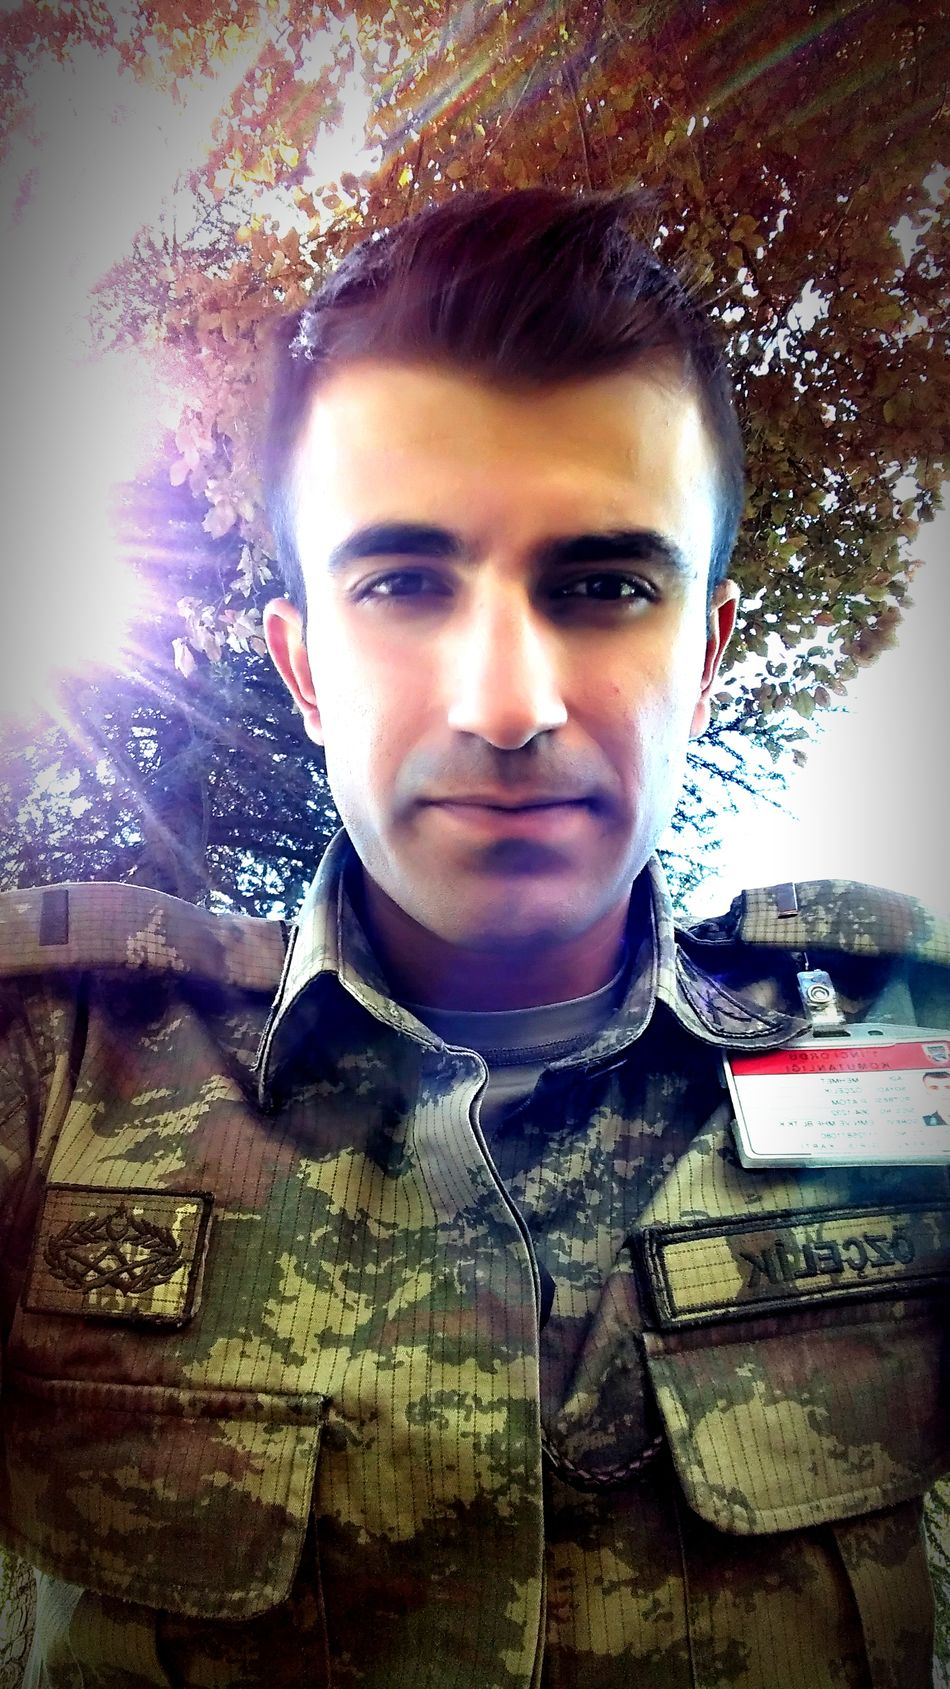 Turkey Military Men Army Komando Comender